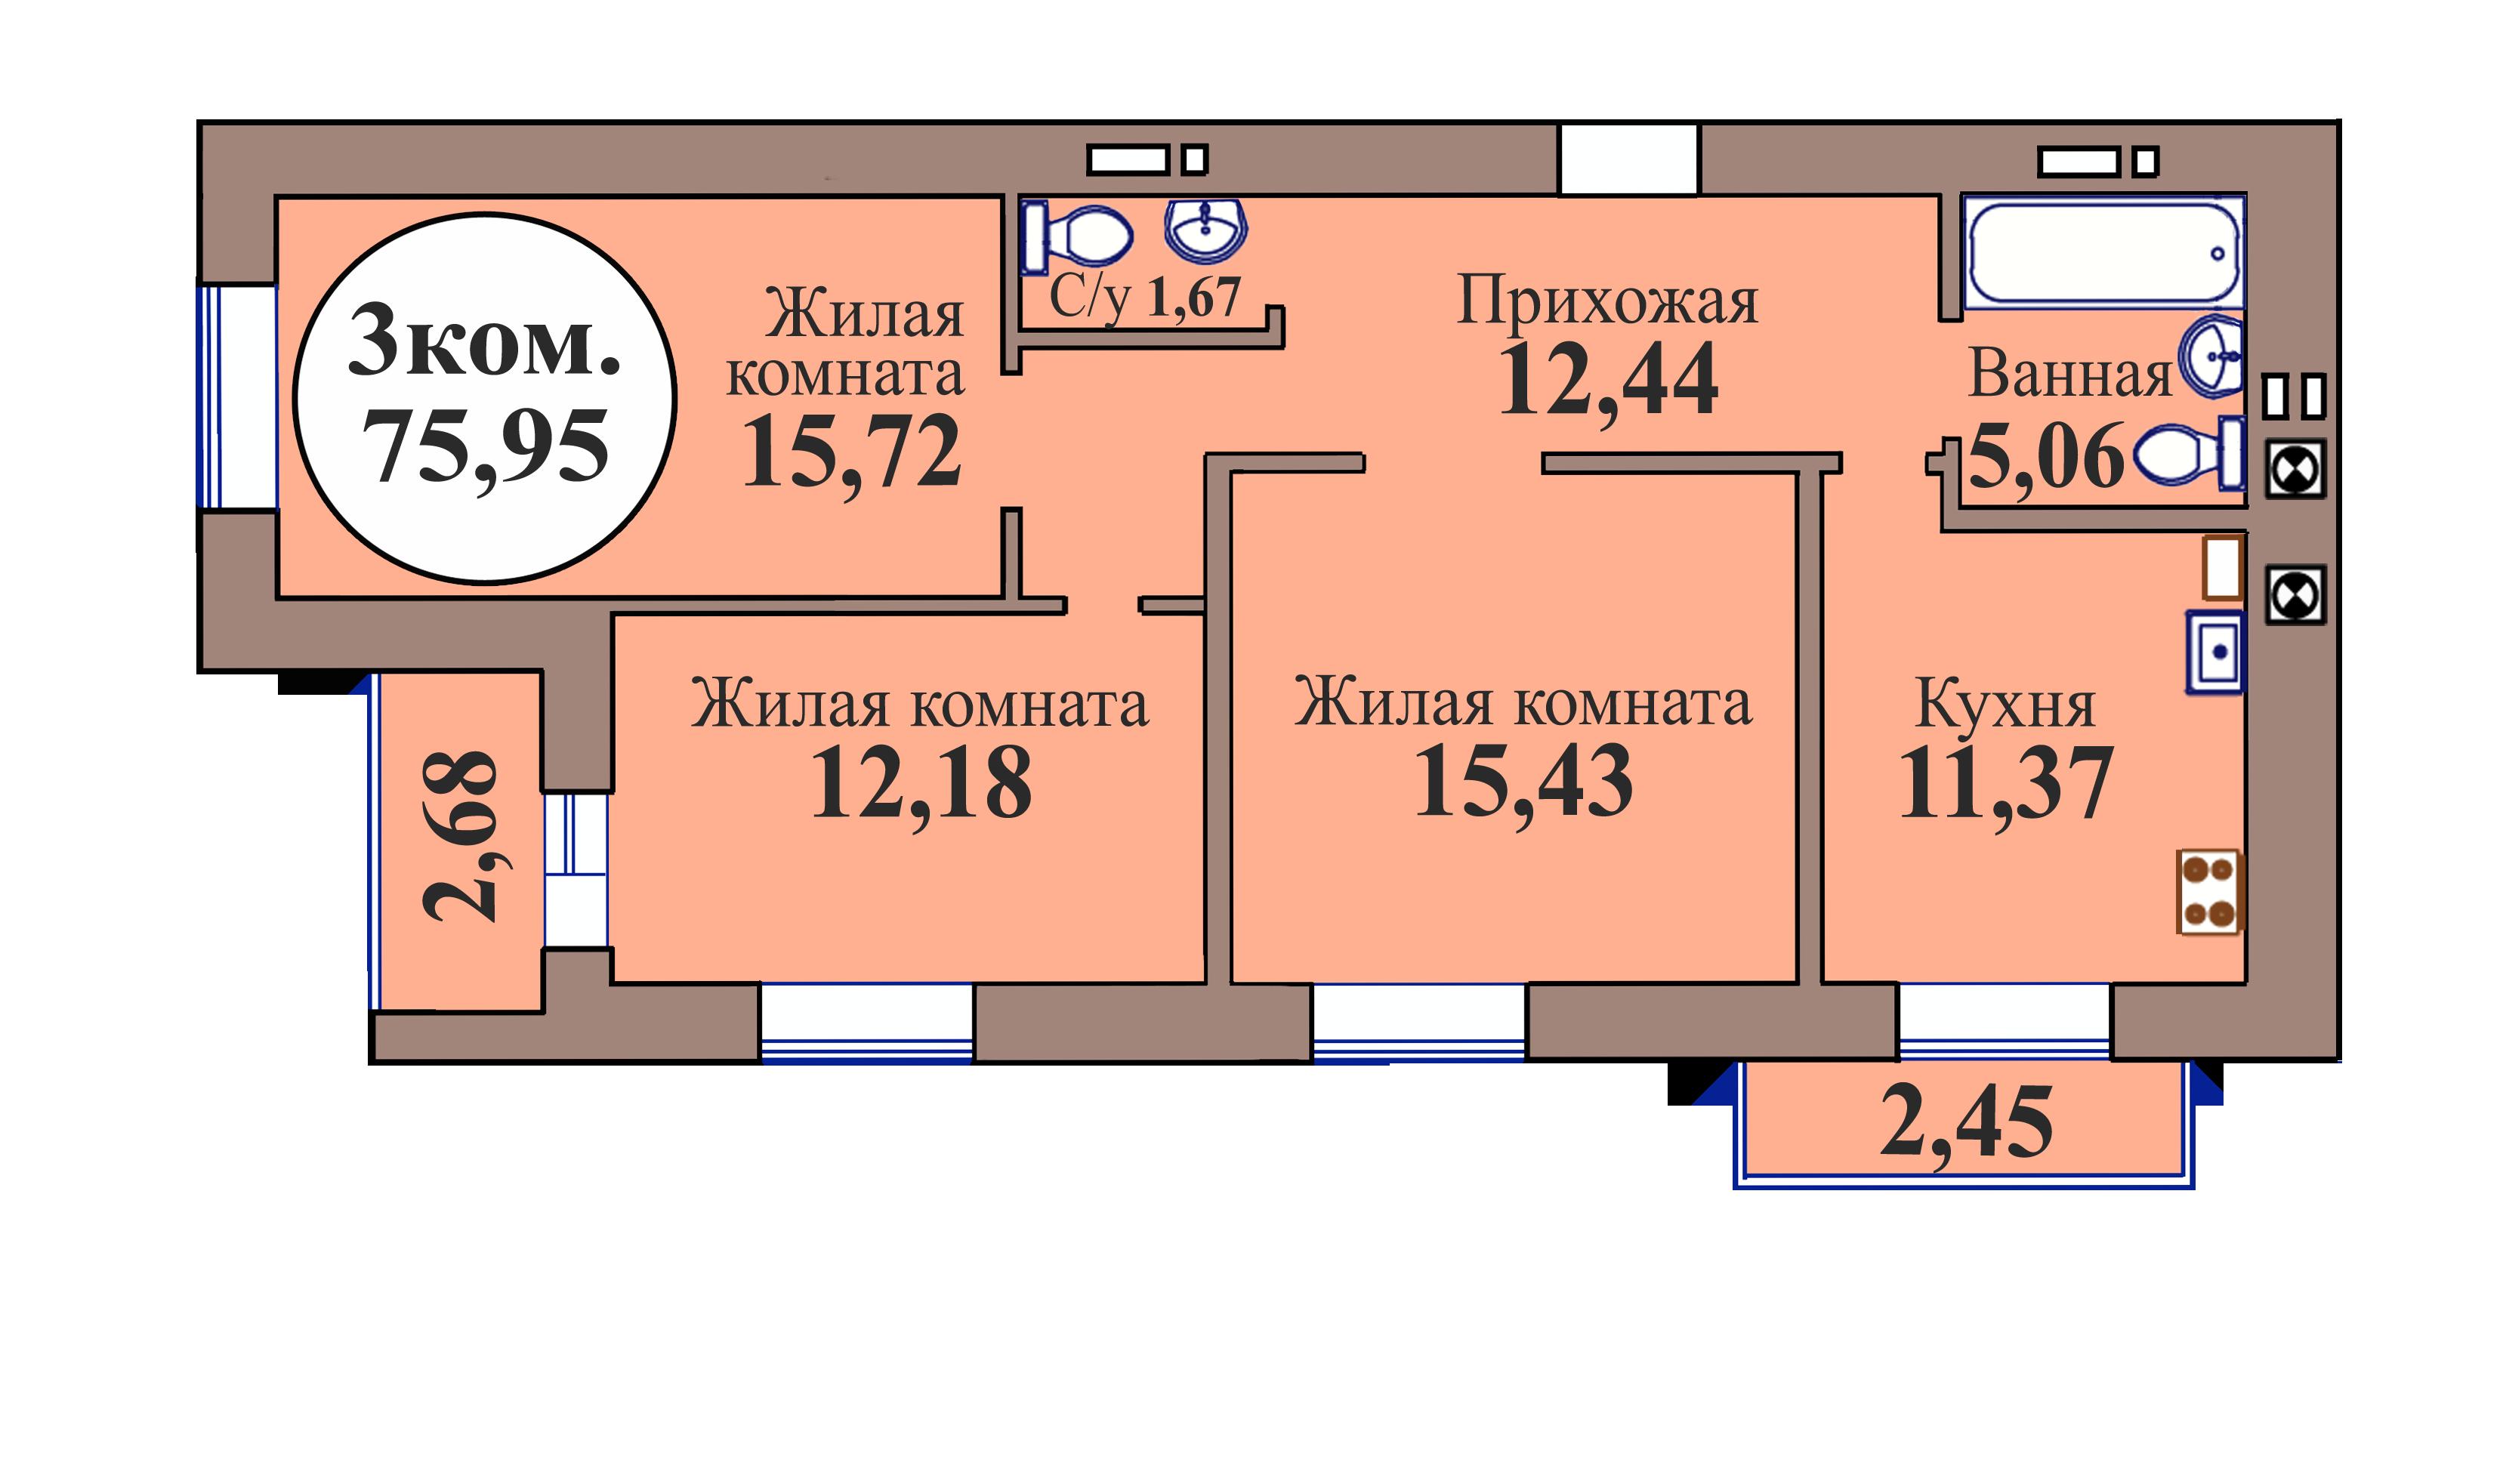 3-комн. кв. по пер. Калининградский, 5 кв. 218 в Калининграде